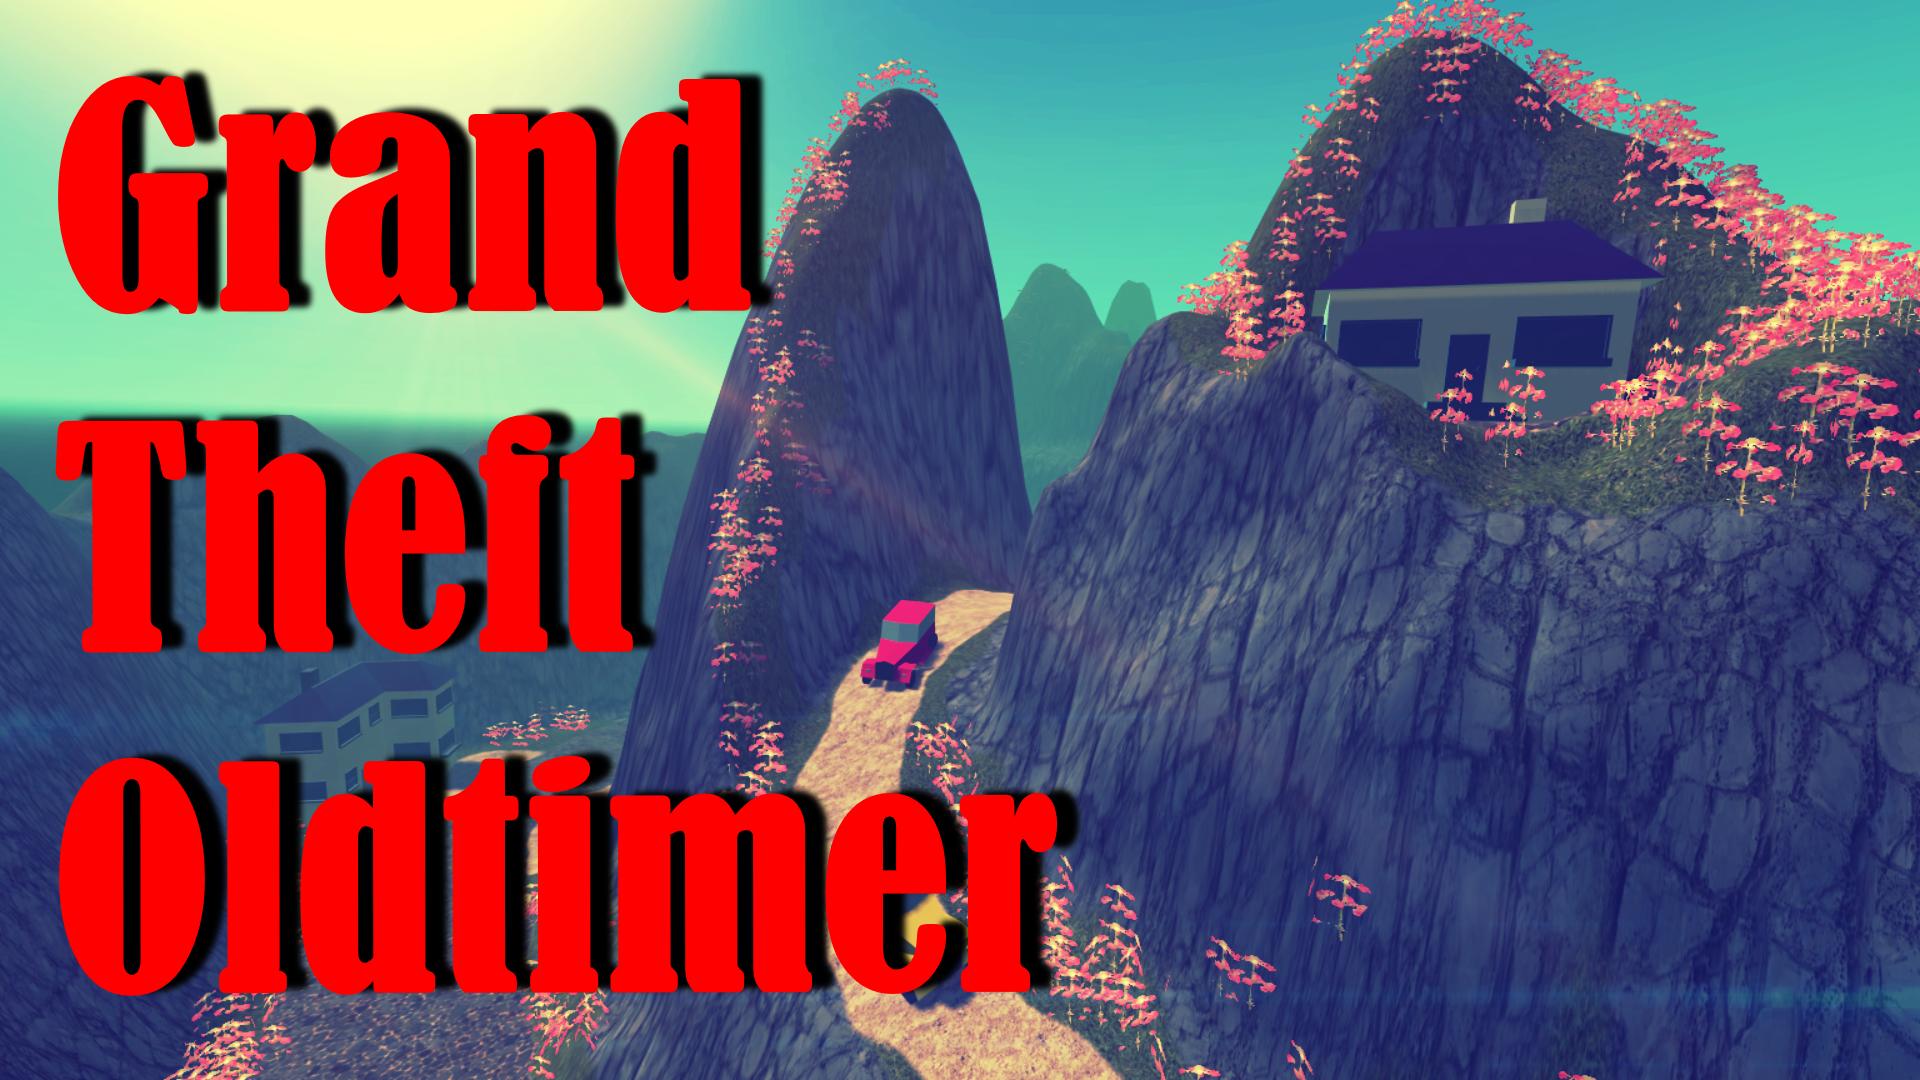 Grand Theft Oldtimer